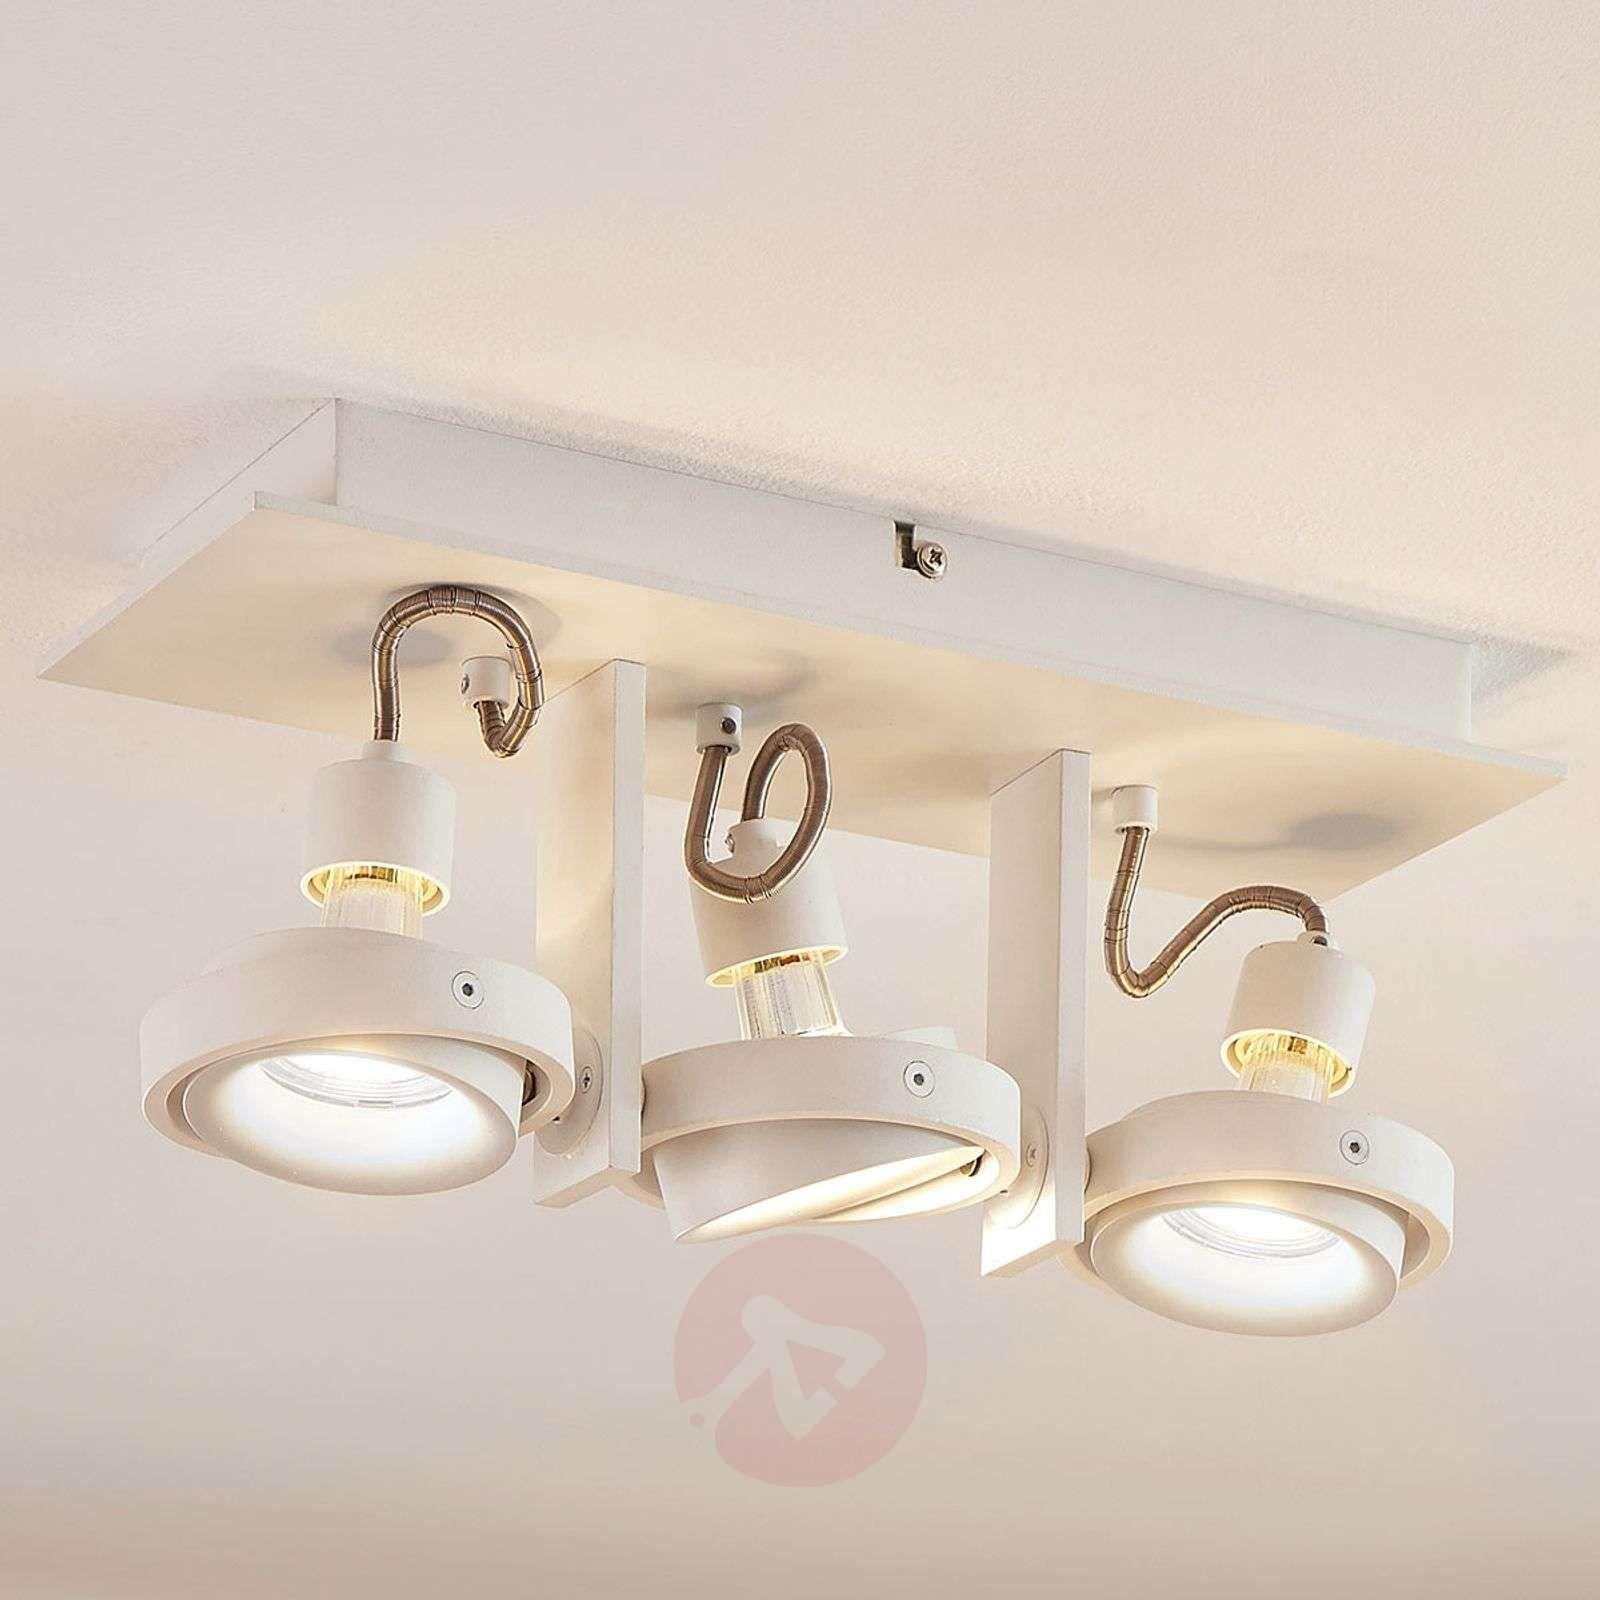 Lampa Sufitowa Led Teska Biała 3 Punkty Lampy Sufitowe